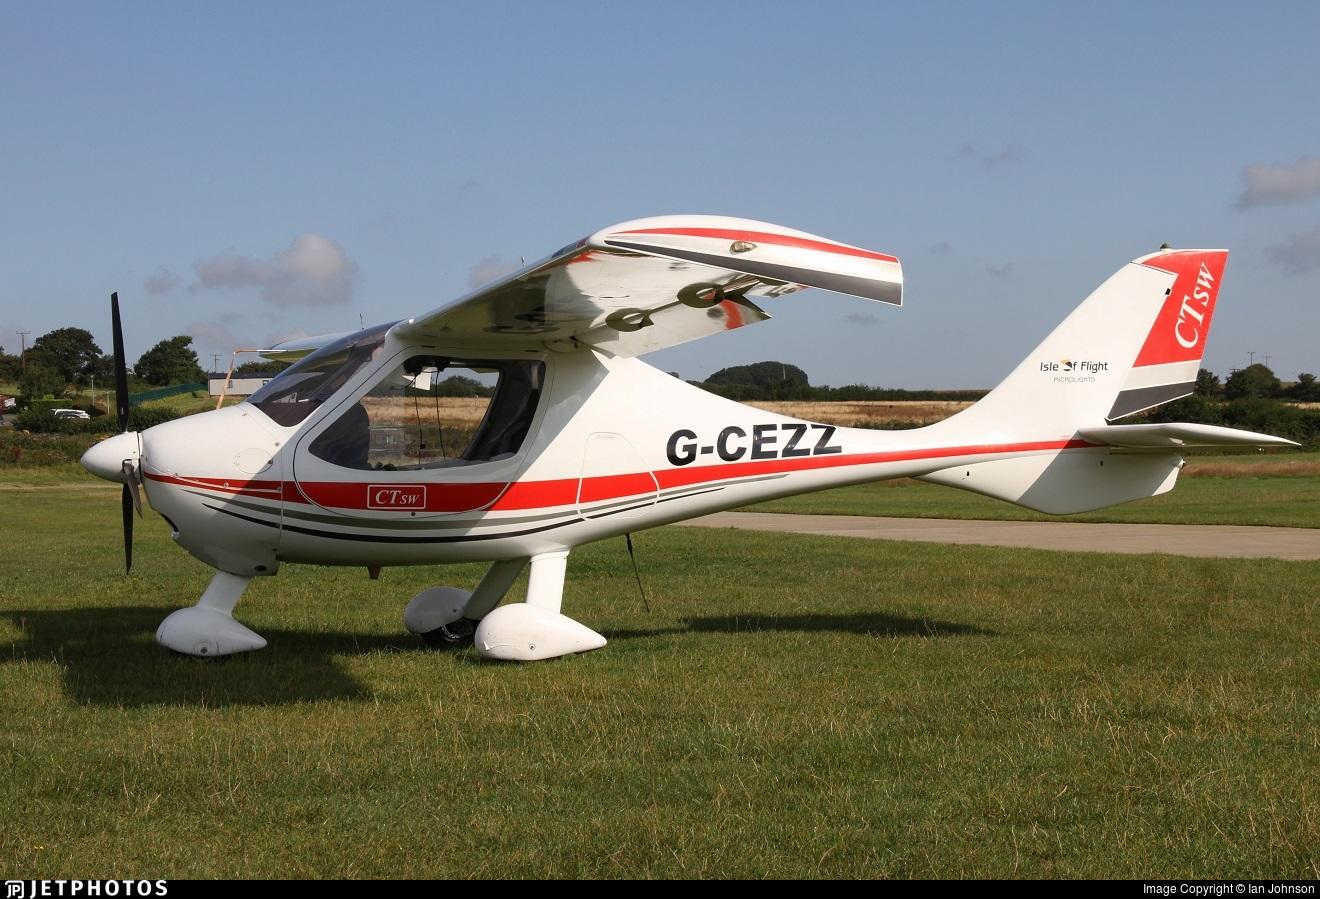 G-CEZZ - Flight Design CTSW - Isle of Flight Microlights